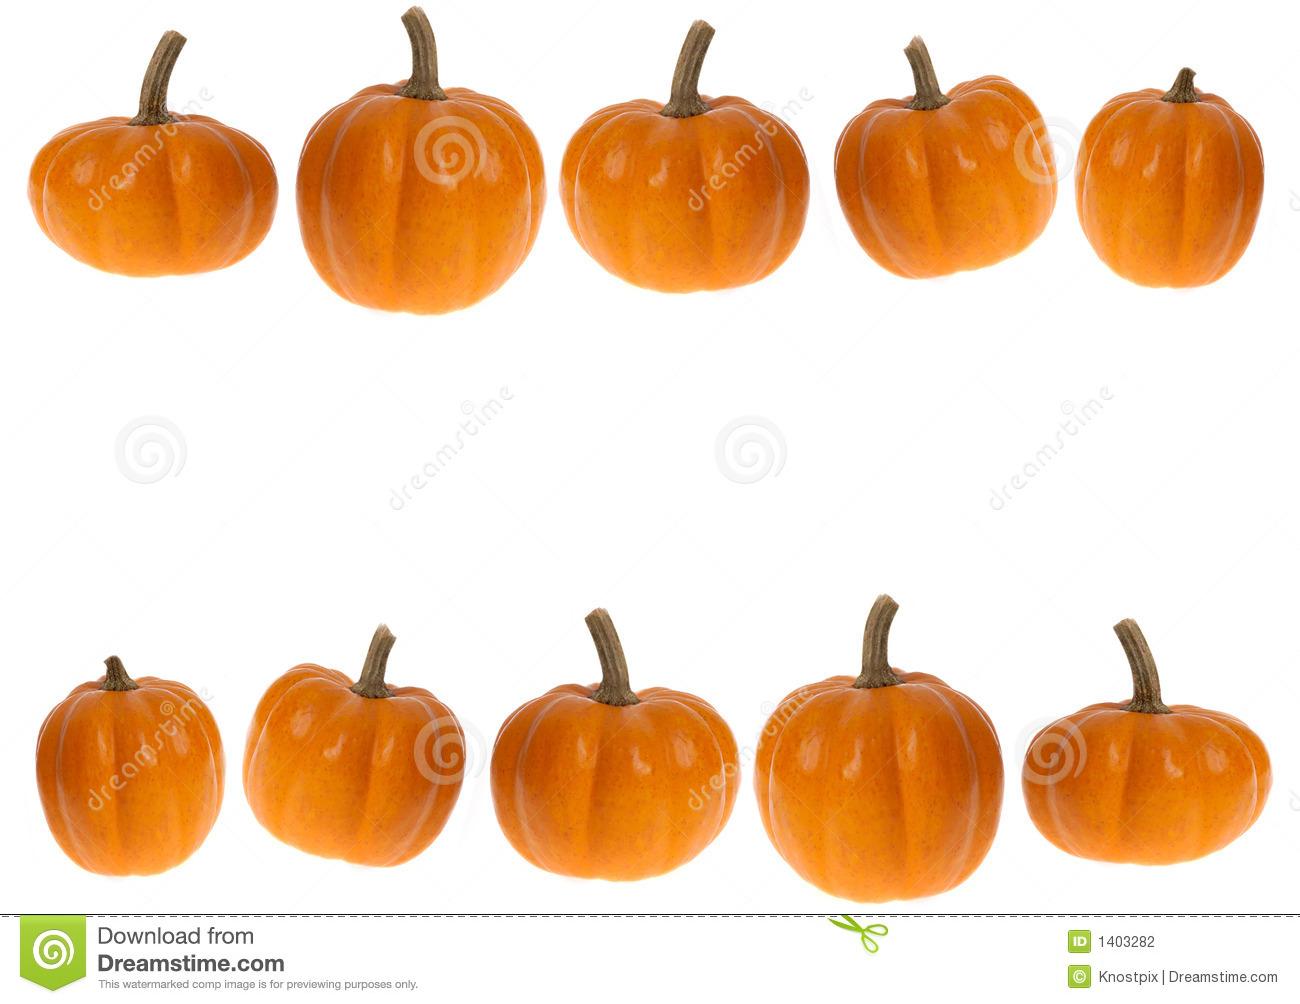 Pumpkin row clipart banner transparent download Background Or Border Image Of Pumpkins; Thanksgiving Or Hallowee ... banner transparent download